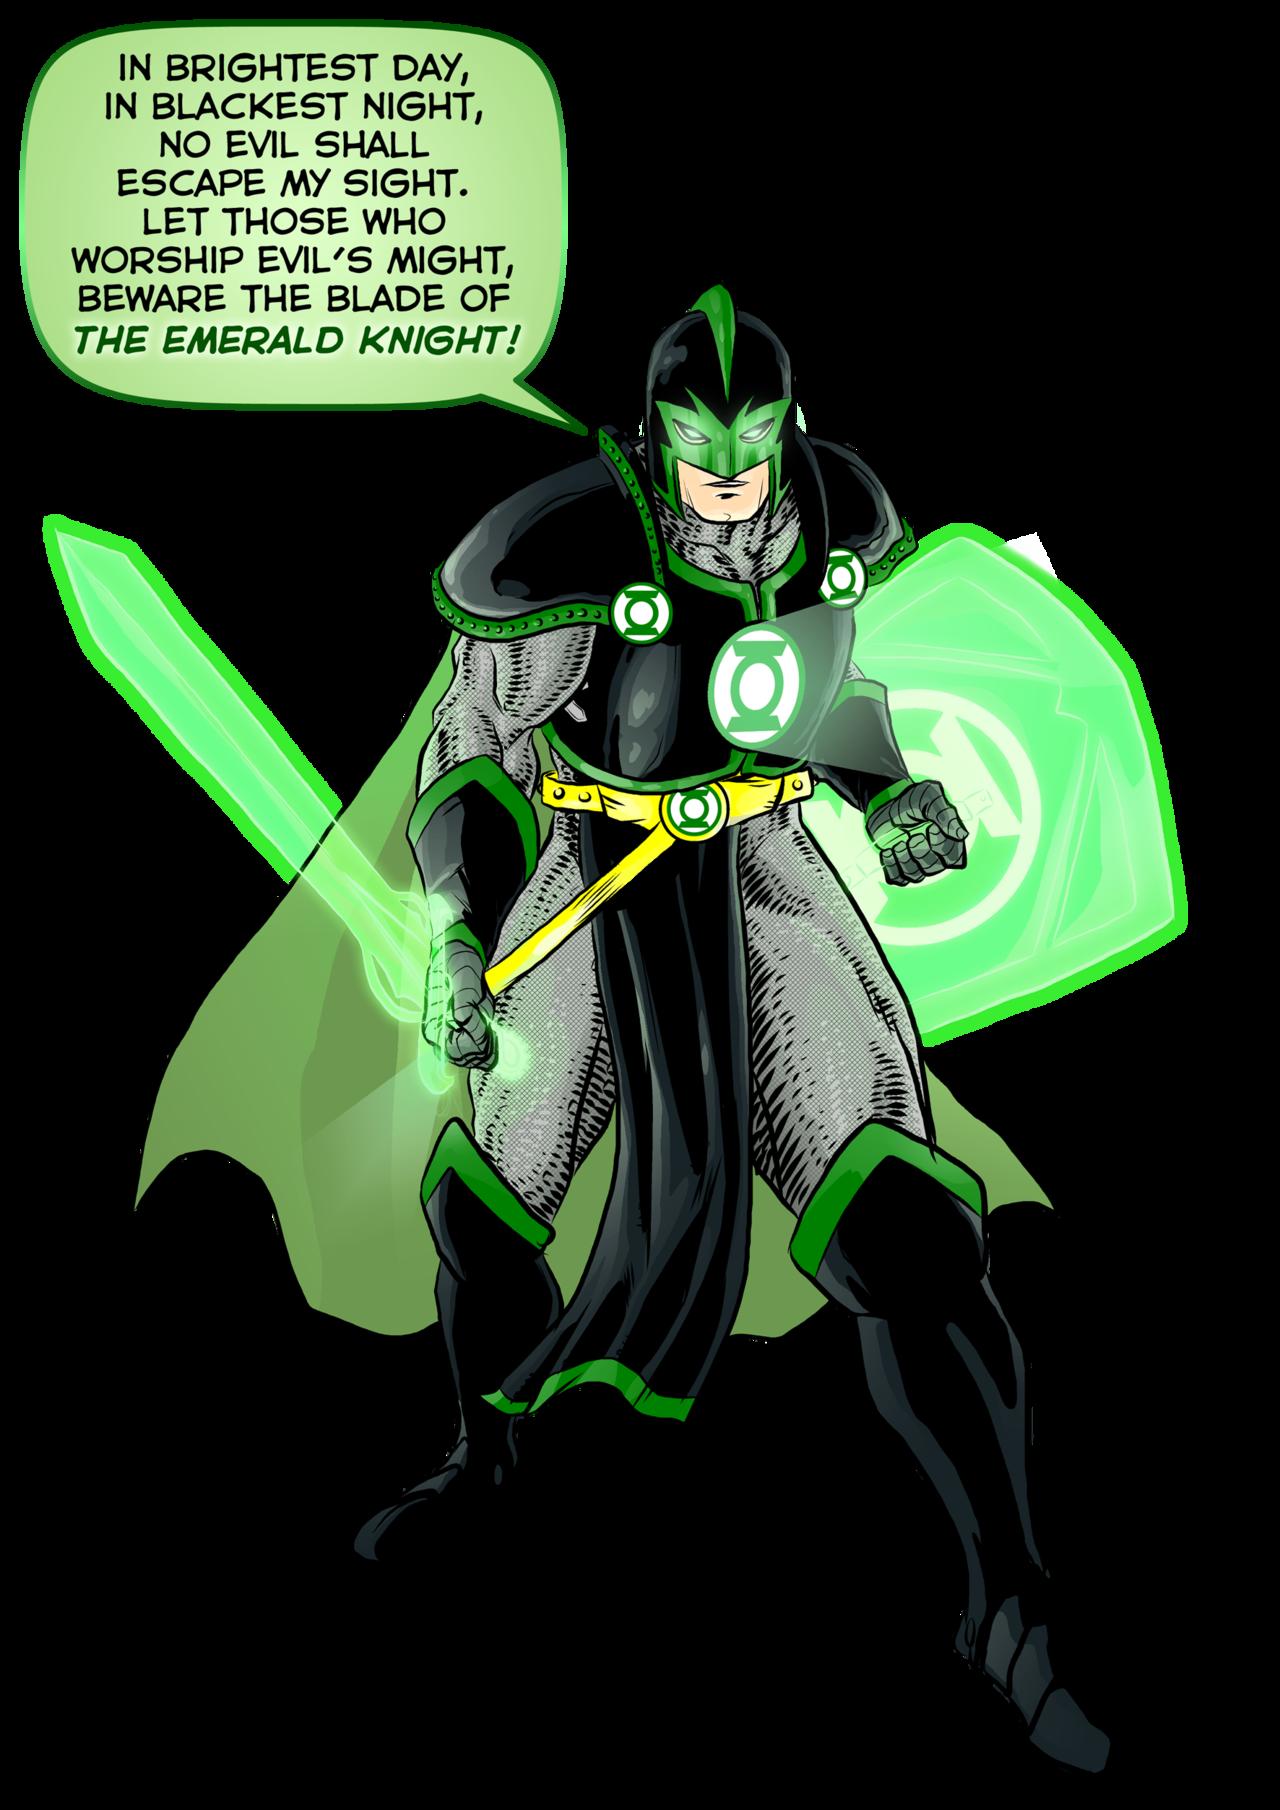 The Emerald Knight Green Lantern Green Knight Green Lantern Hal Jordan